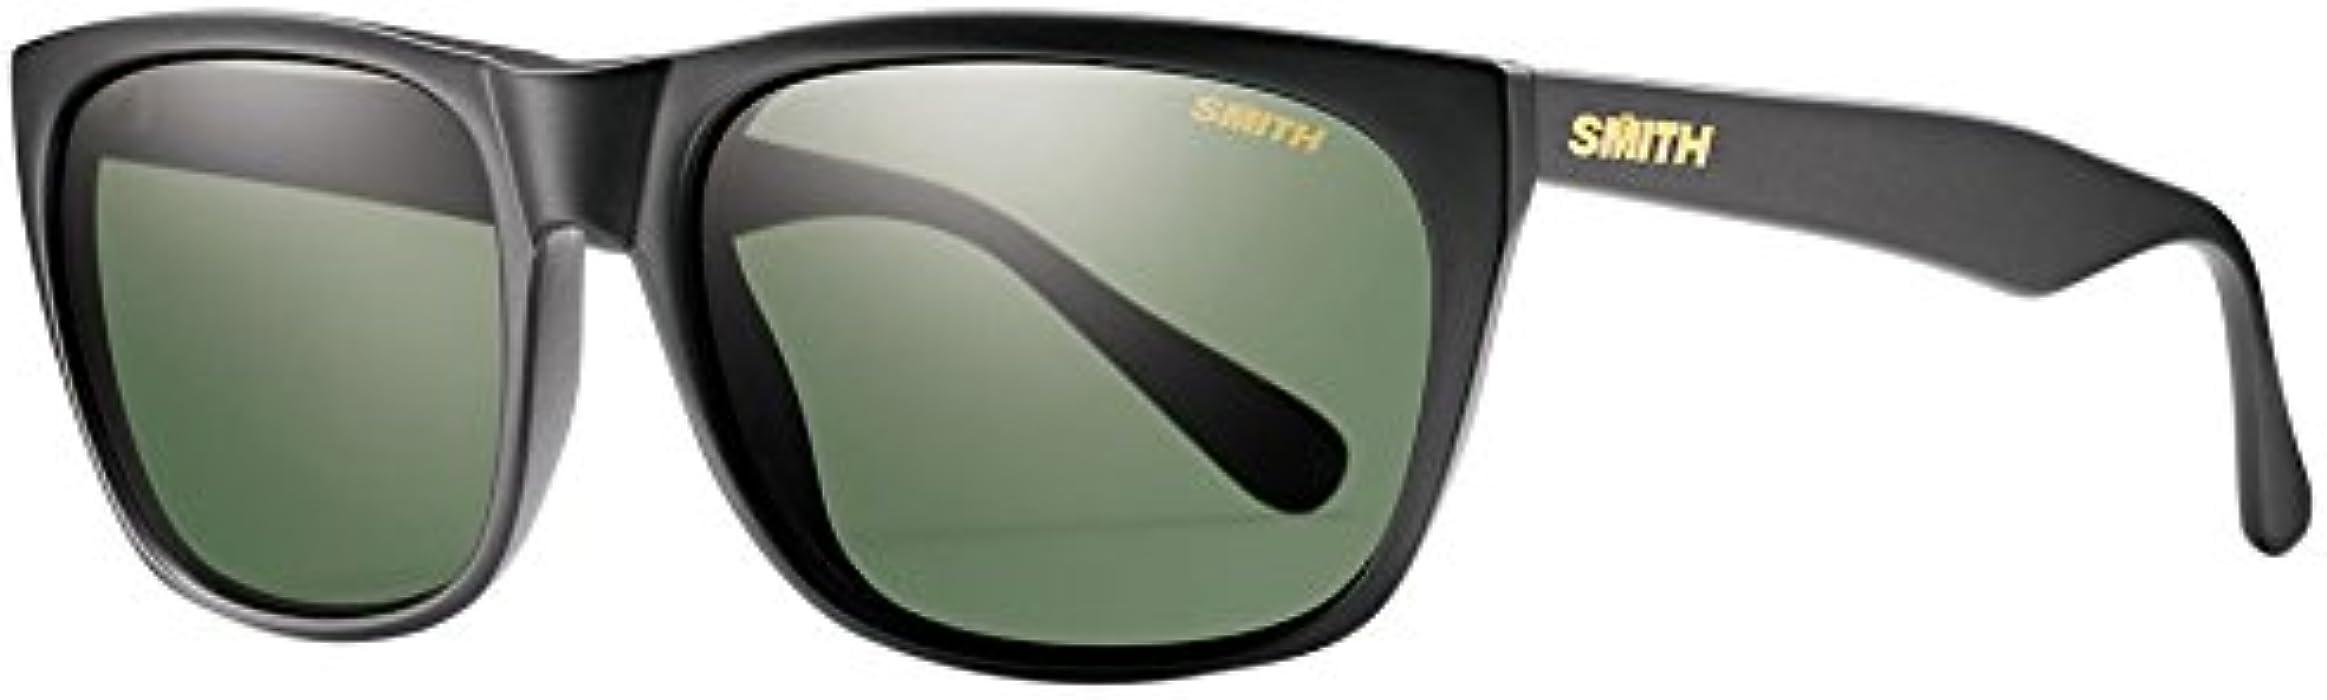 4e46ffe96d6 Smith Optics - TIOGA